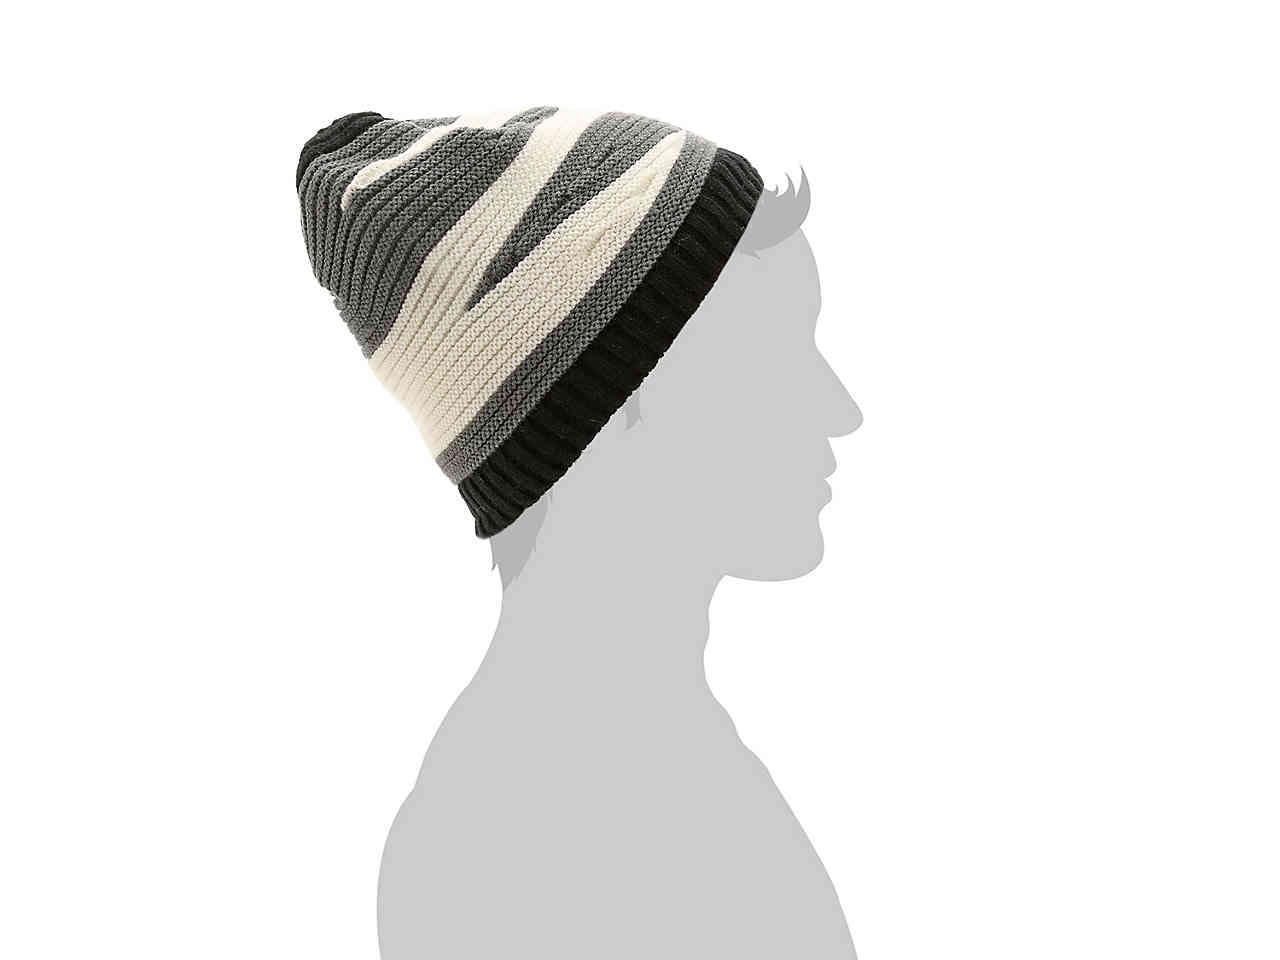 eb53b5d8644 Lyst - Chaos Nash Stripe Beanie in Gray for Men